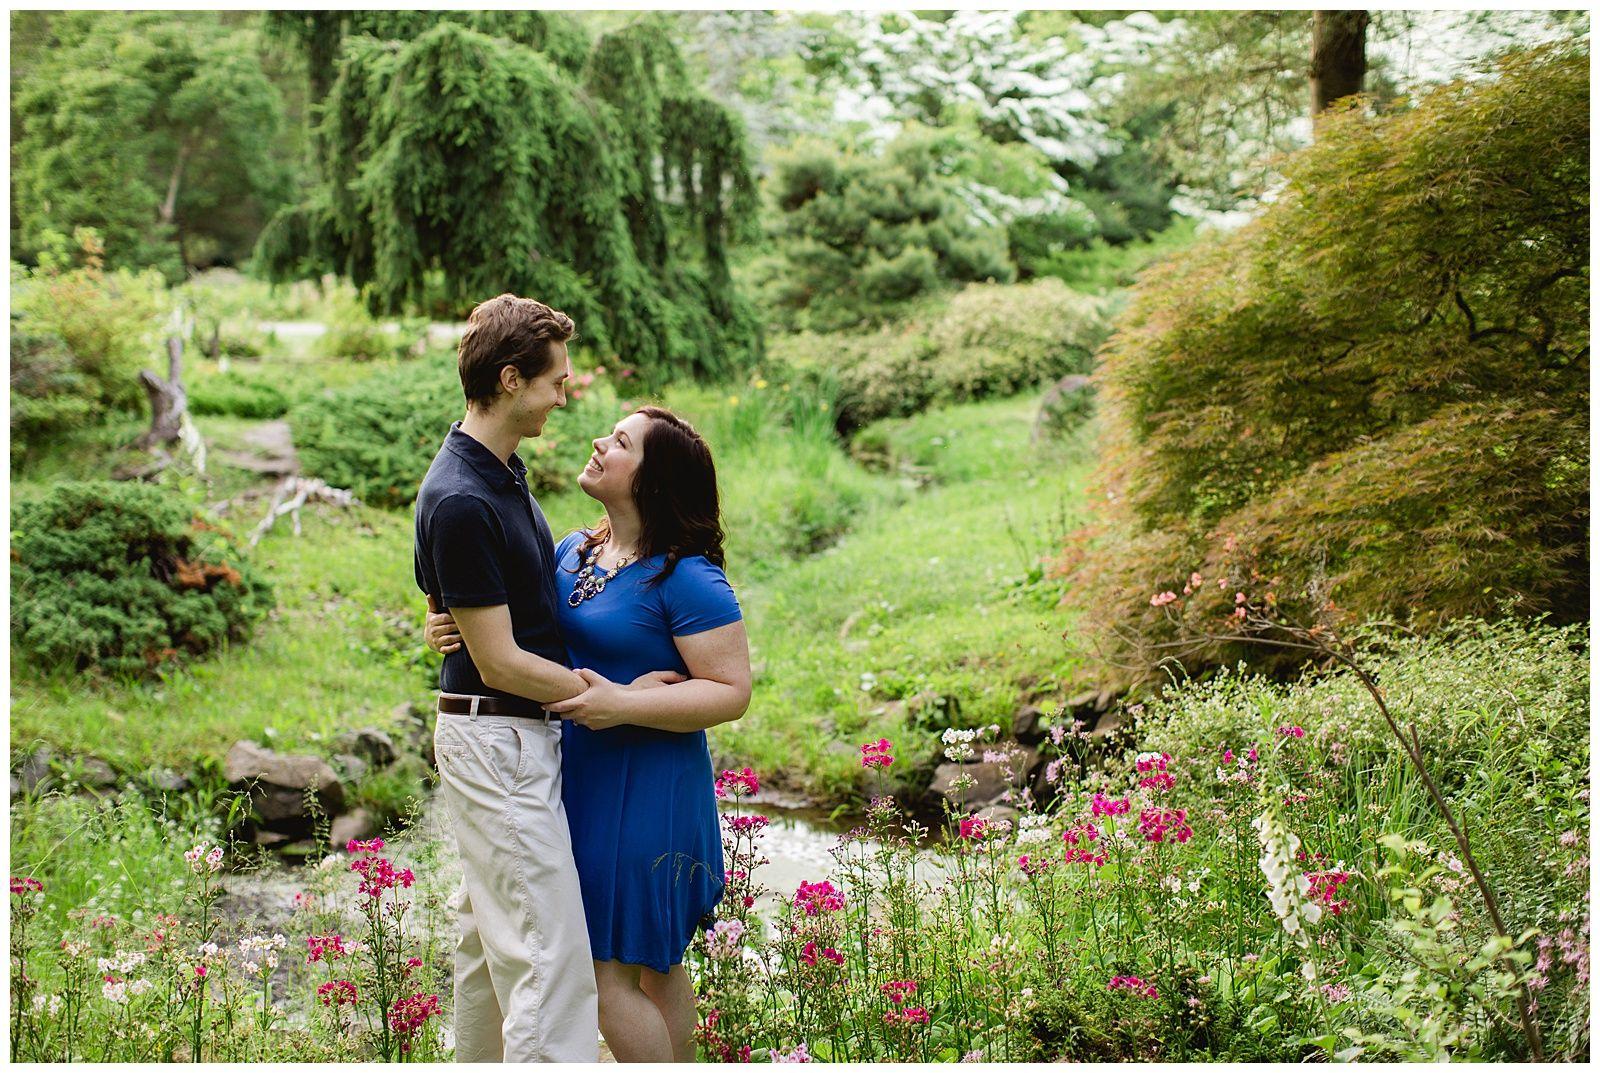 Kara And Mike Engaged Laurelwood Arboretum Wayne New Jersey